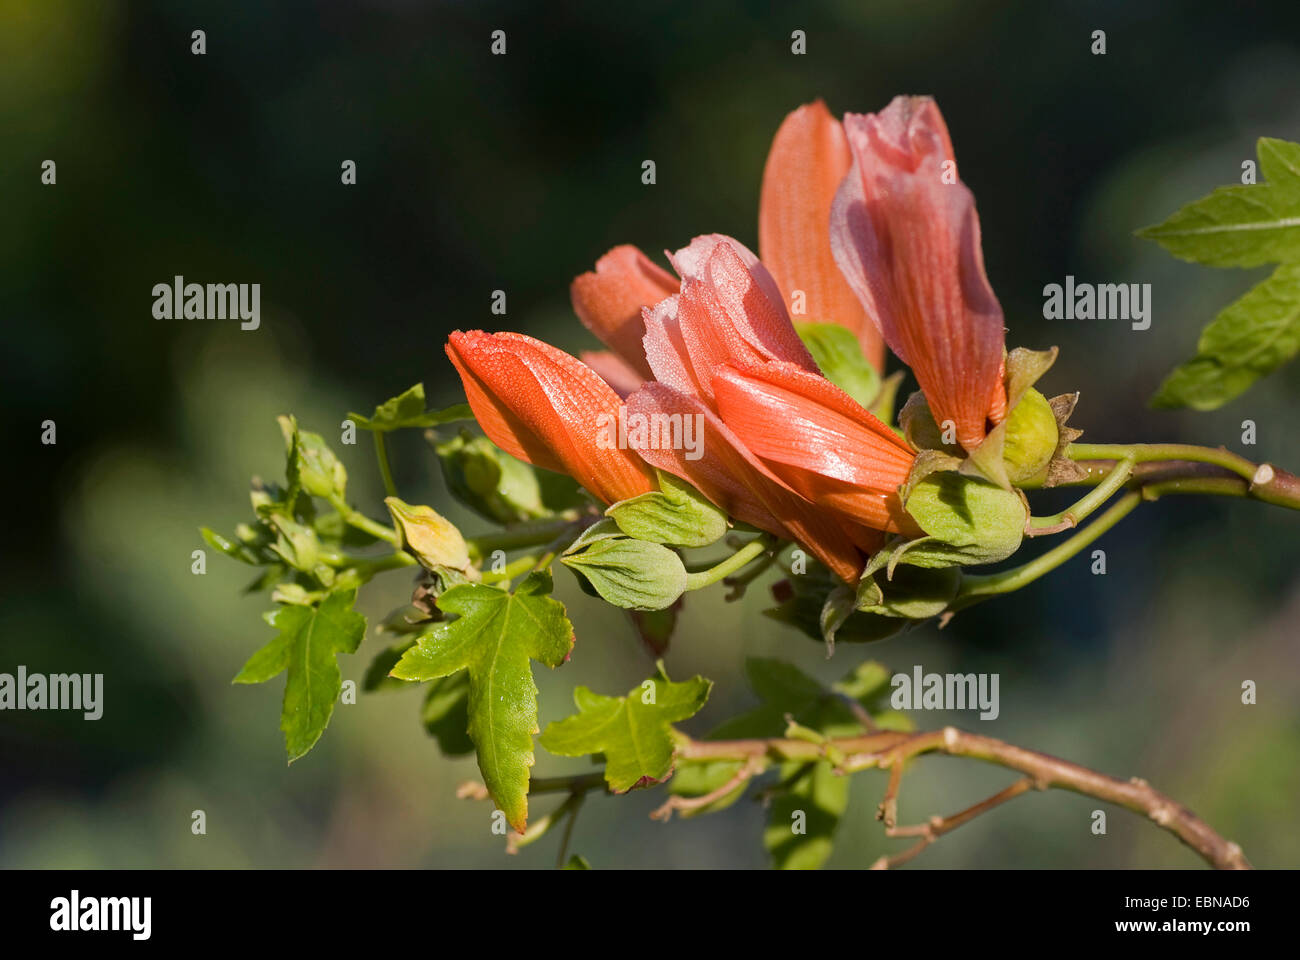 Lachs-rot Kanarischen Strauch Malve (Lavatera Phoenicea), blühen, Kanarische Inseln, Teneriffa Stockfoto